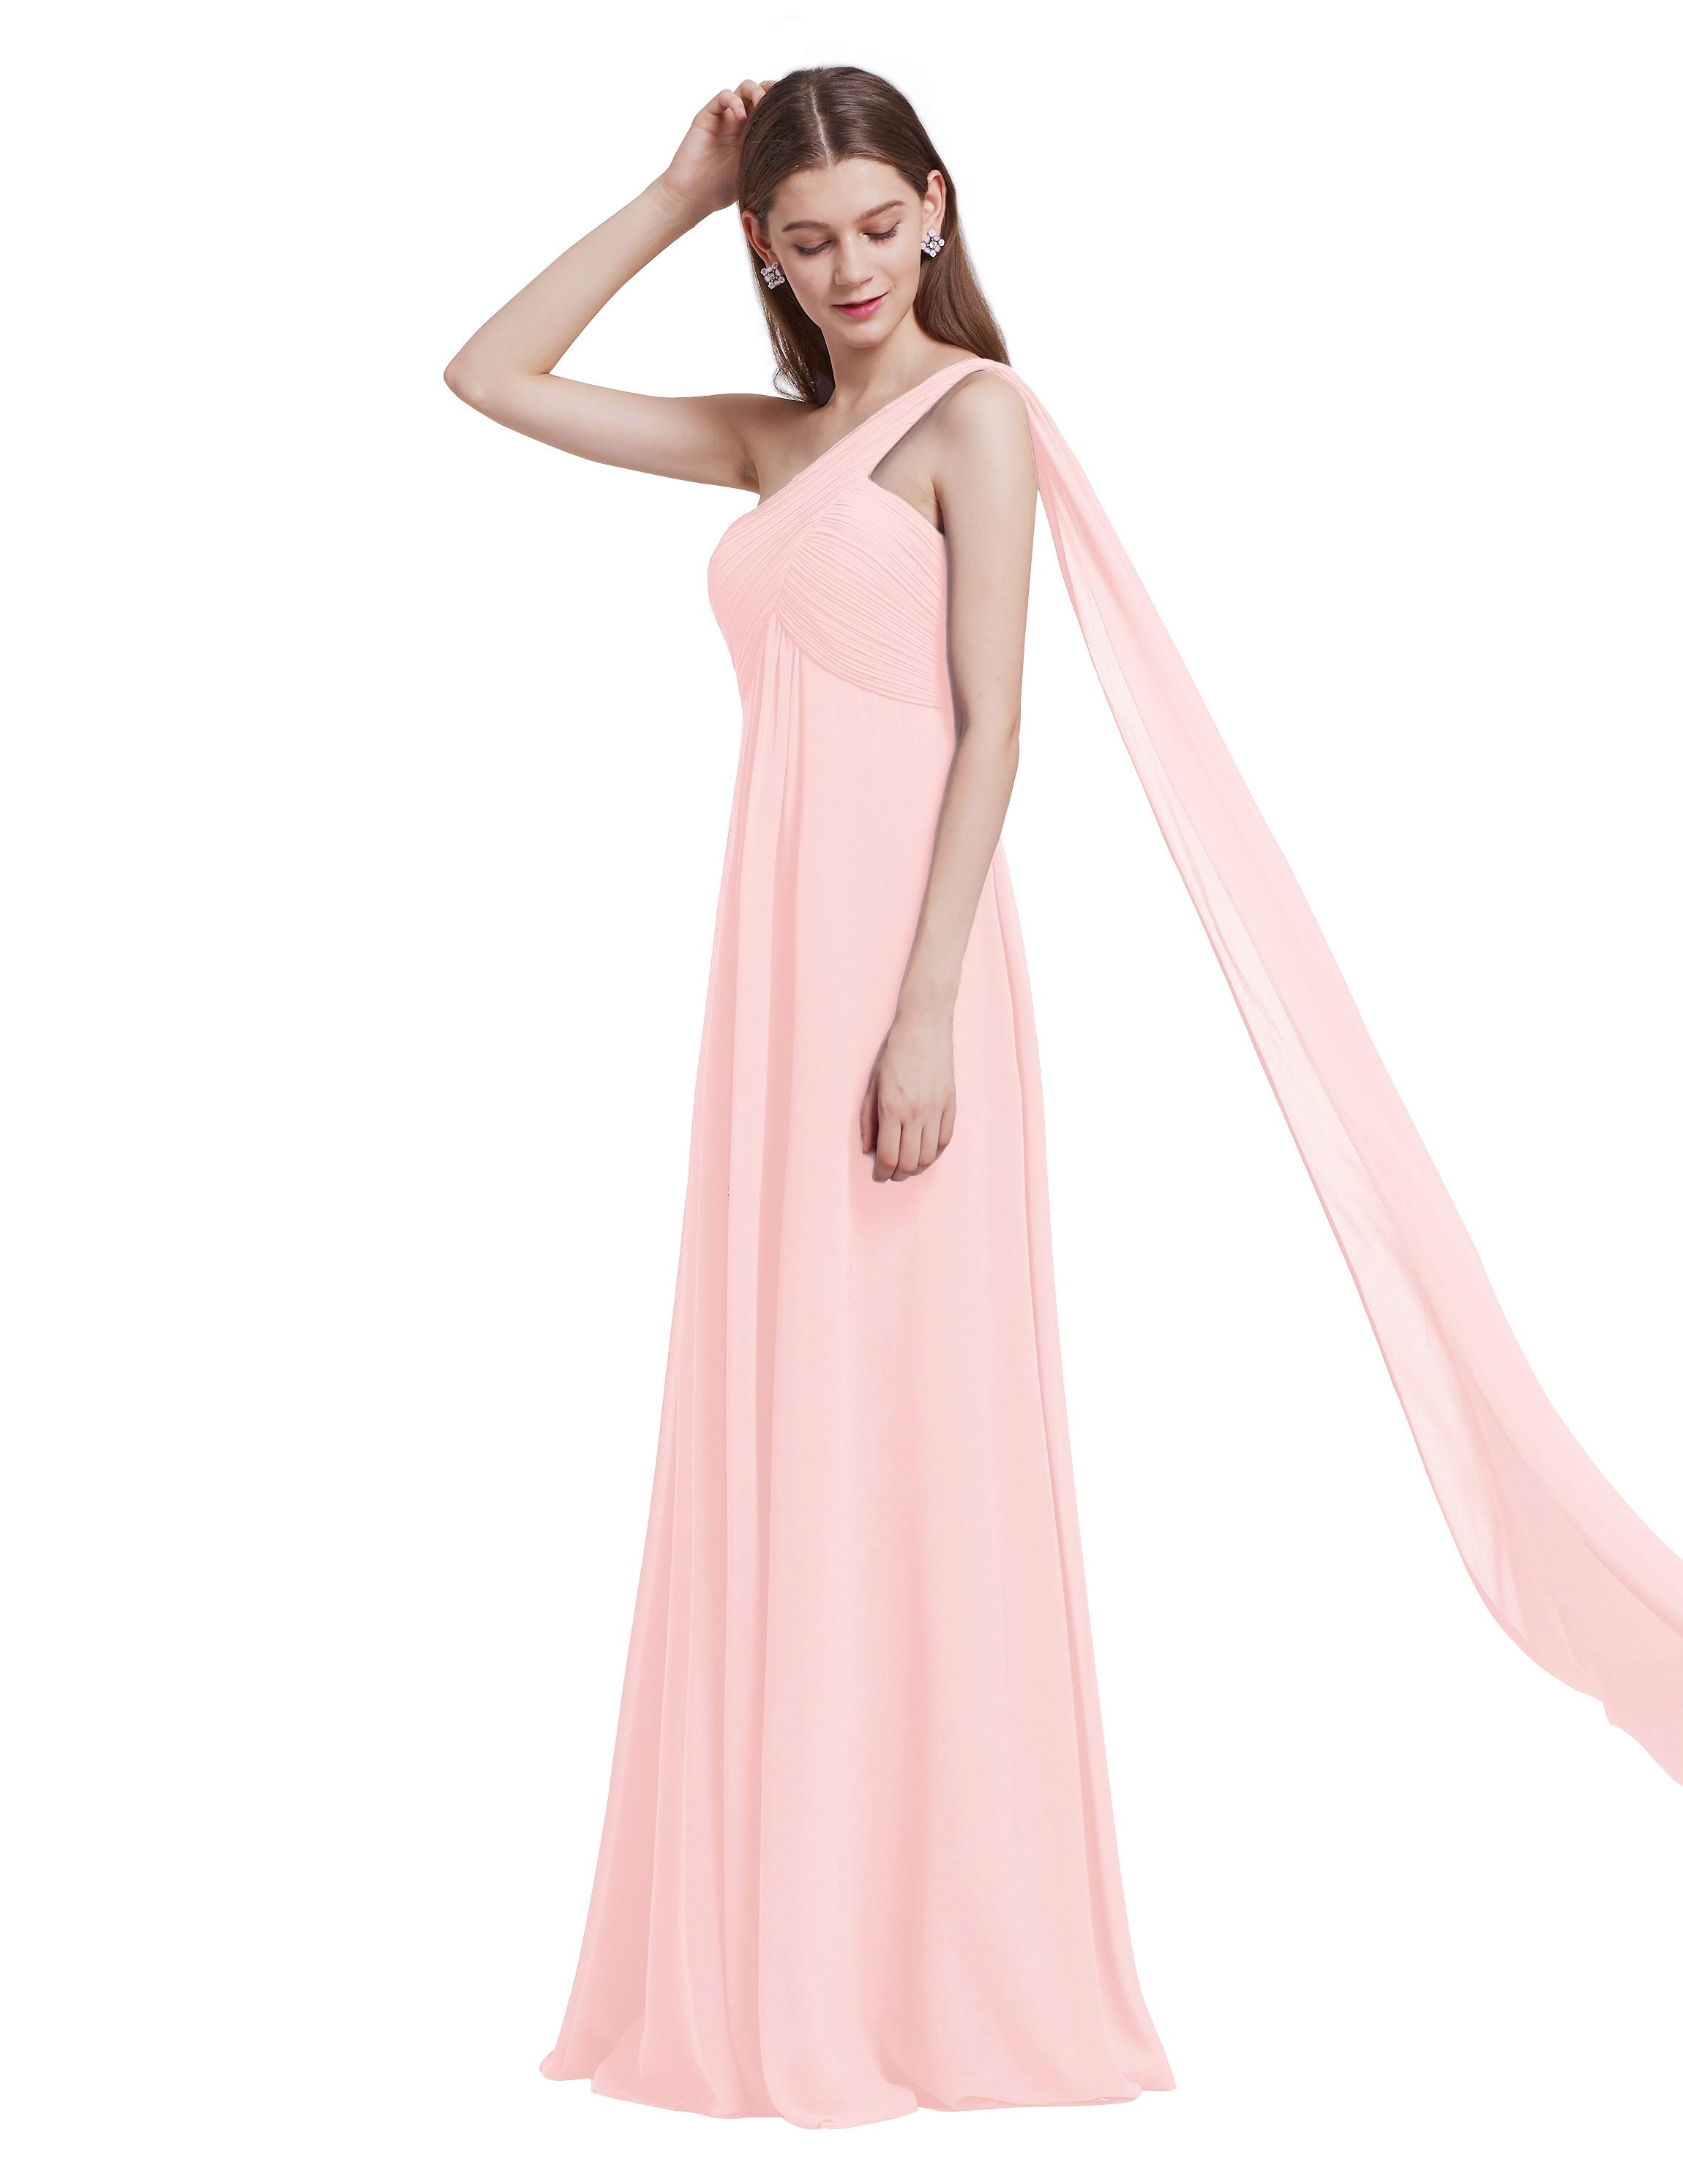 Ever-Pretty-Bridesmaid-Dresses-Chiffon-Ribbon-Long-Formal-Cocktail-Party-Dress thumbnail 23